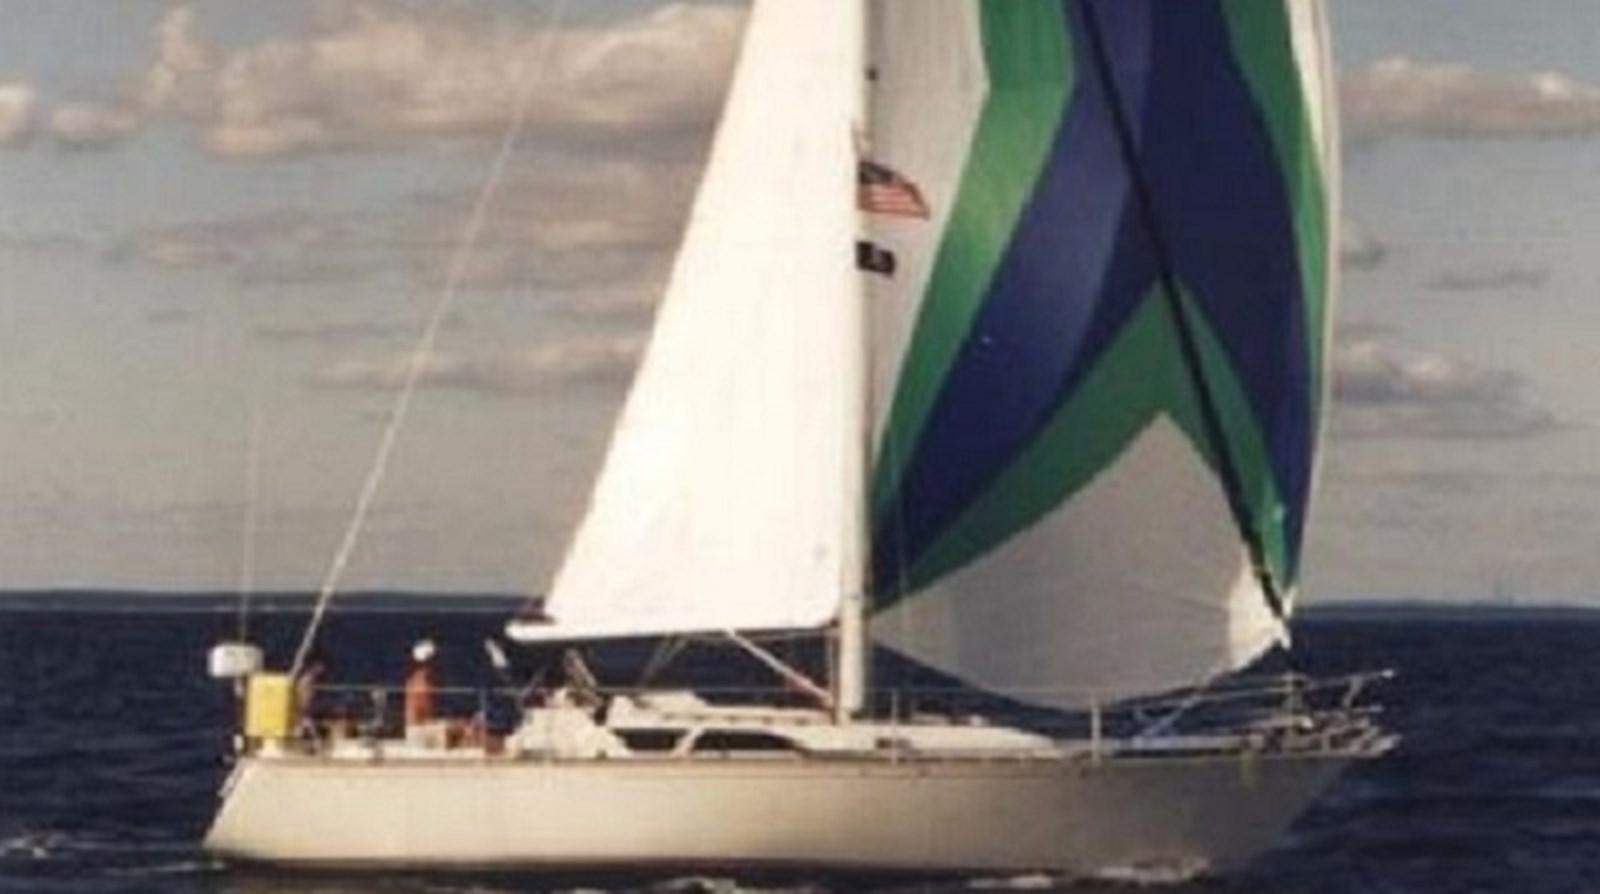 TAZ Sailing 1 1987 C & C Yachts Mark III Cruising Sailboat 2821900